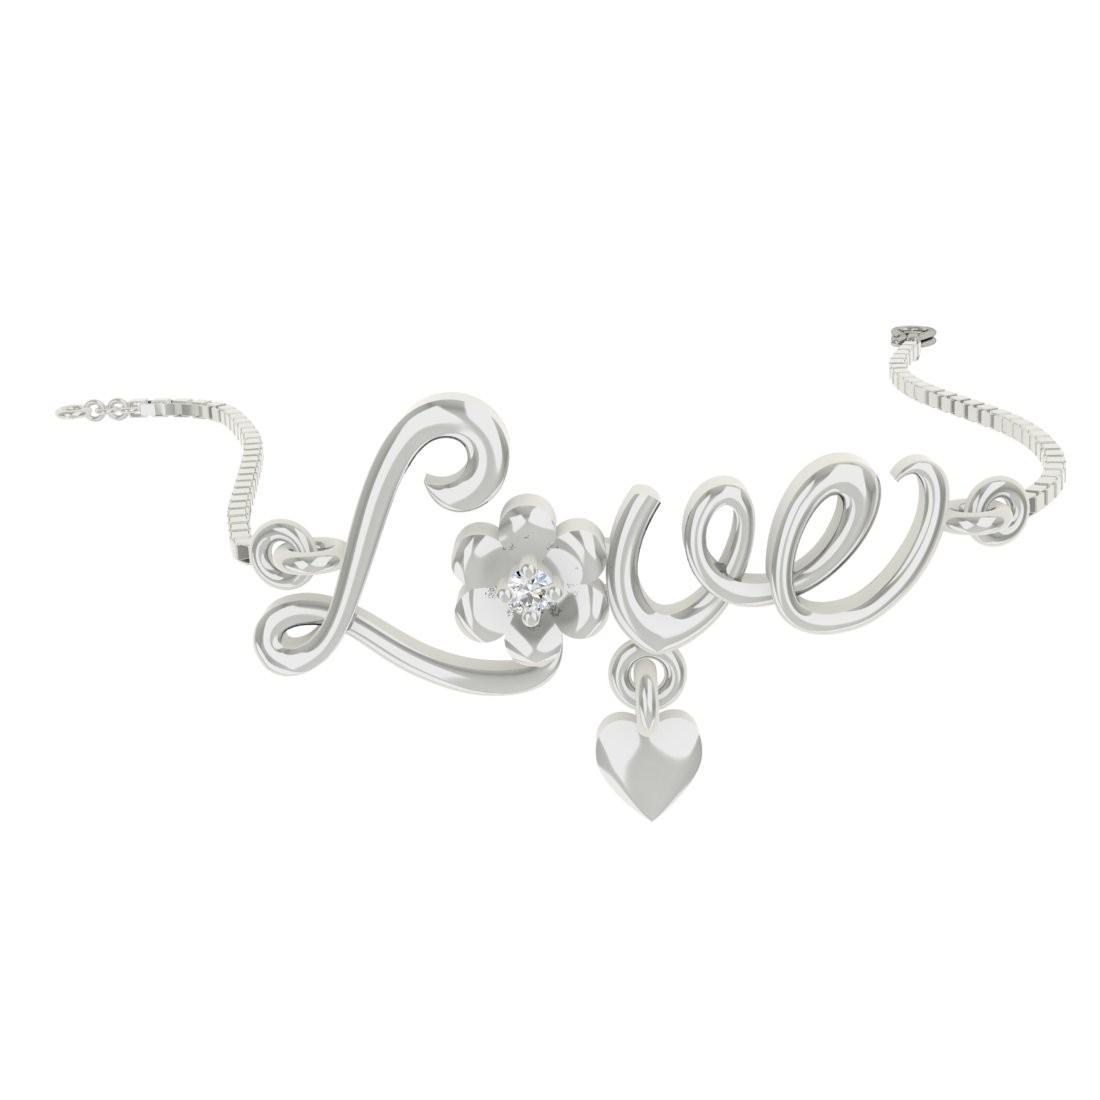 TBZ TheOriginal Daily Wear White Gold 18kt Diamond Bracelet(Rhodium Plated) at flipkart